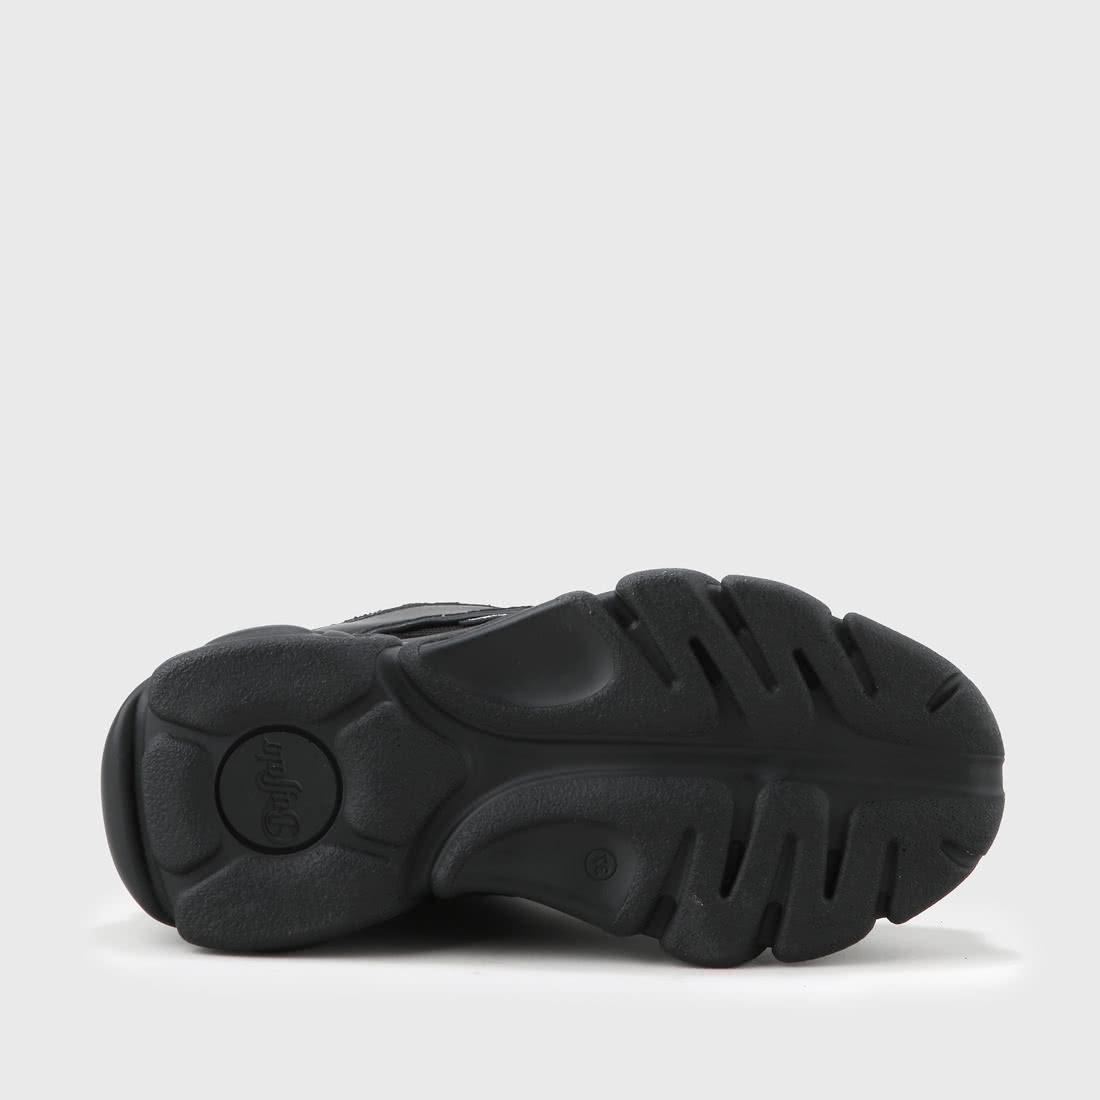 8d0cbe60a6020e CLD Colby Sneaker aus Mesh und Lederoptik schwarz online kaufen ...